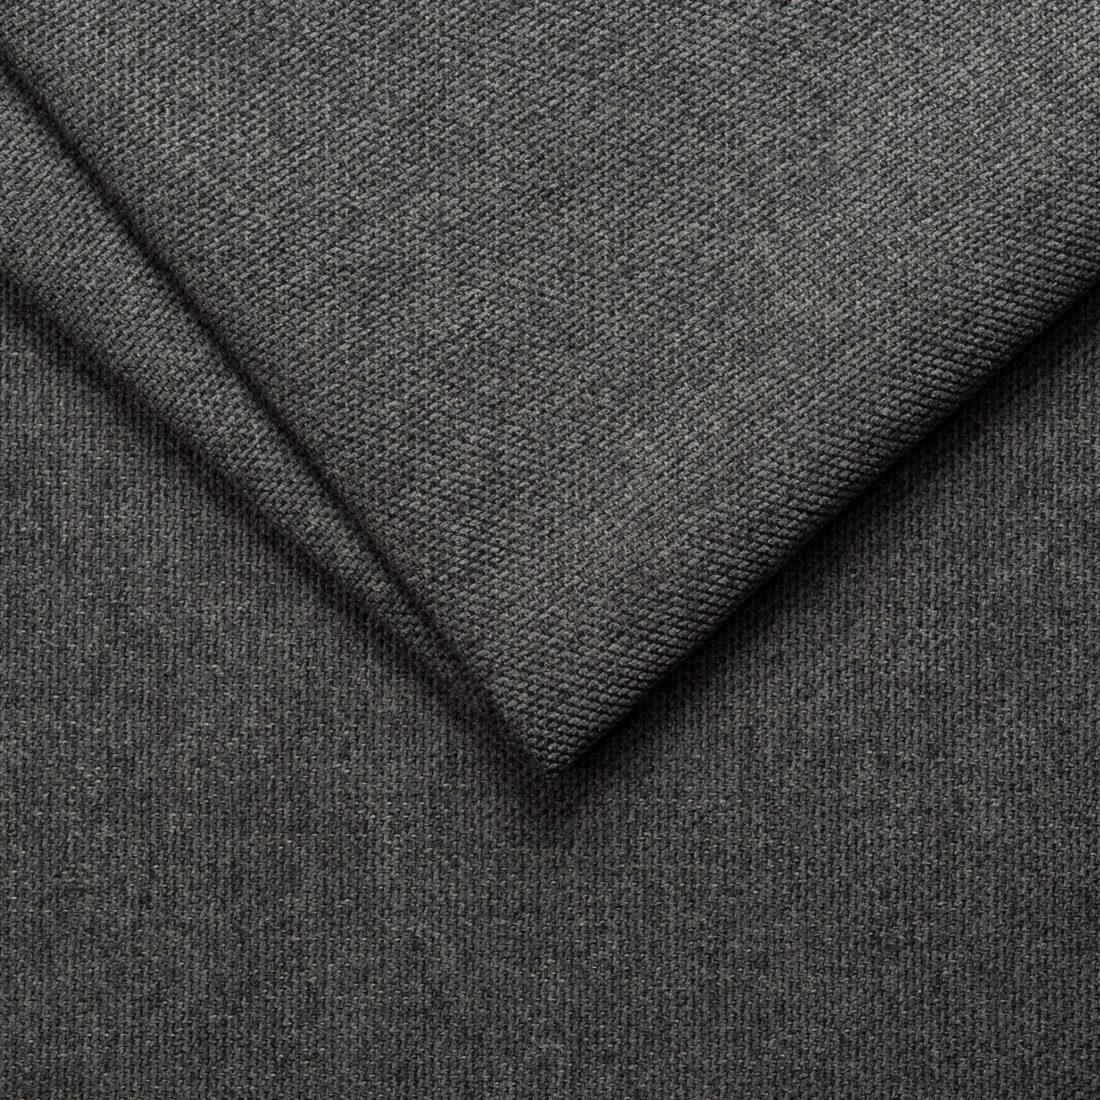 Мебельная ткань Austin 20 Graphite, рогожка